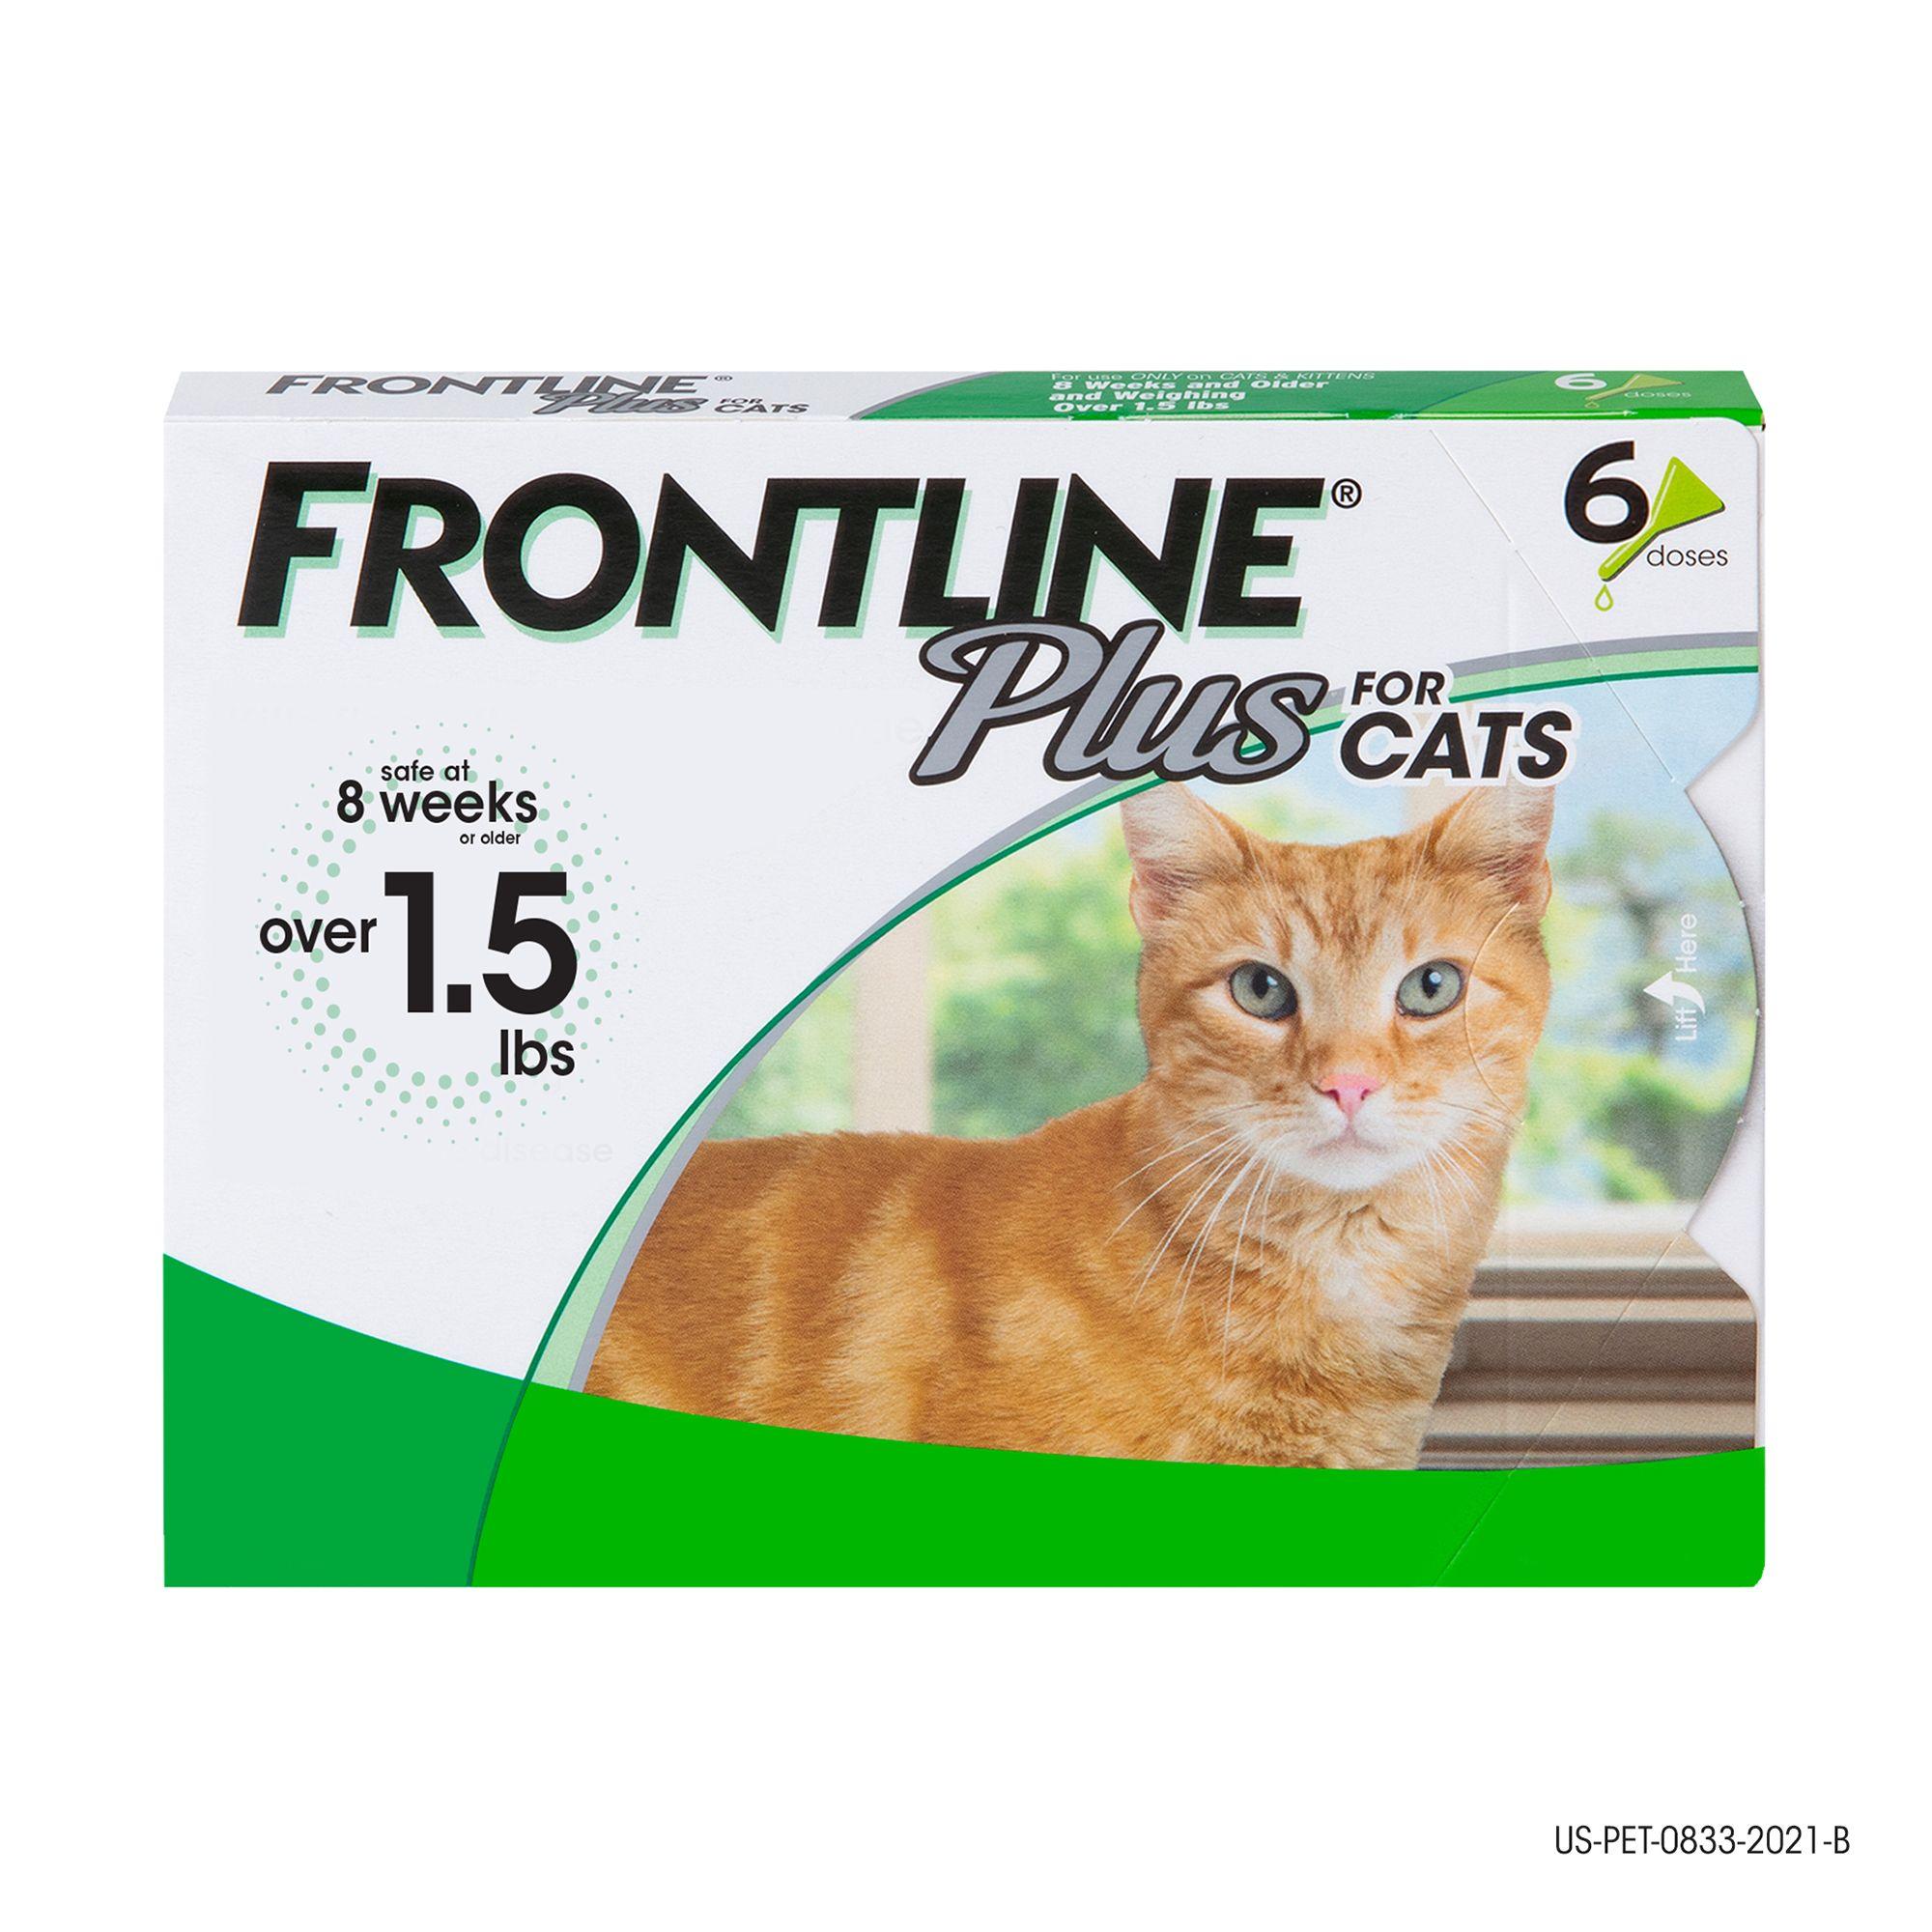 Frontline Plus Cat Flea And Tick Treatment Size 6 Count